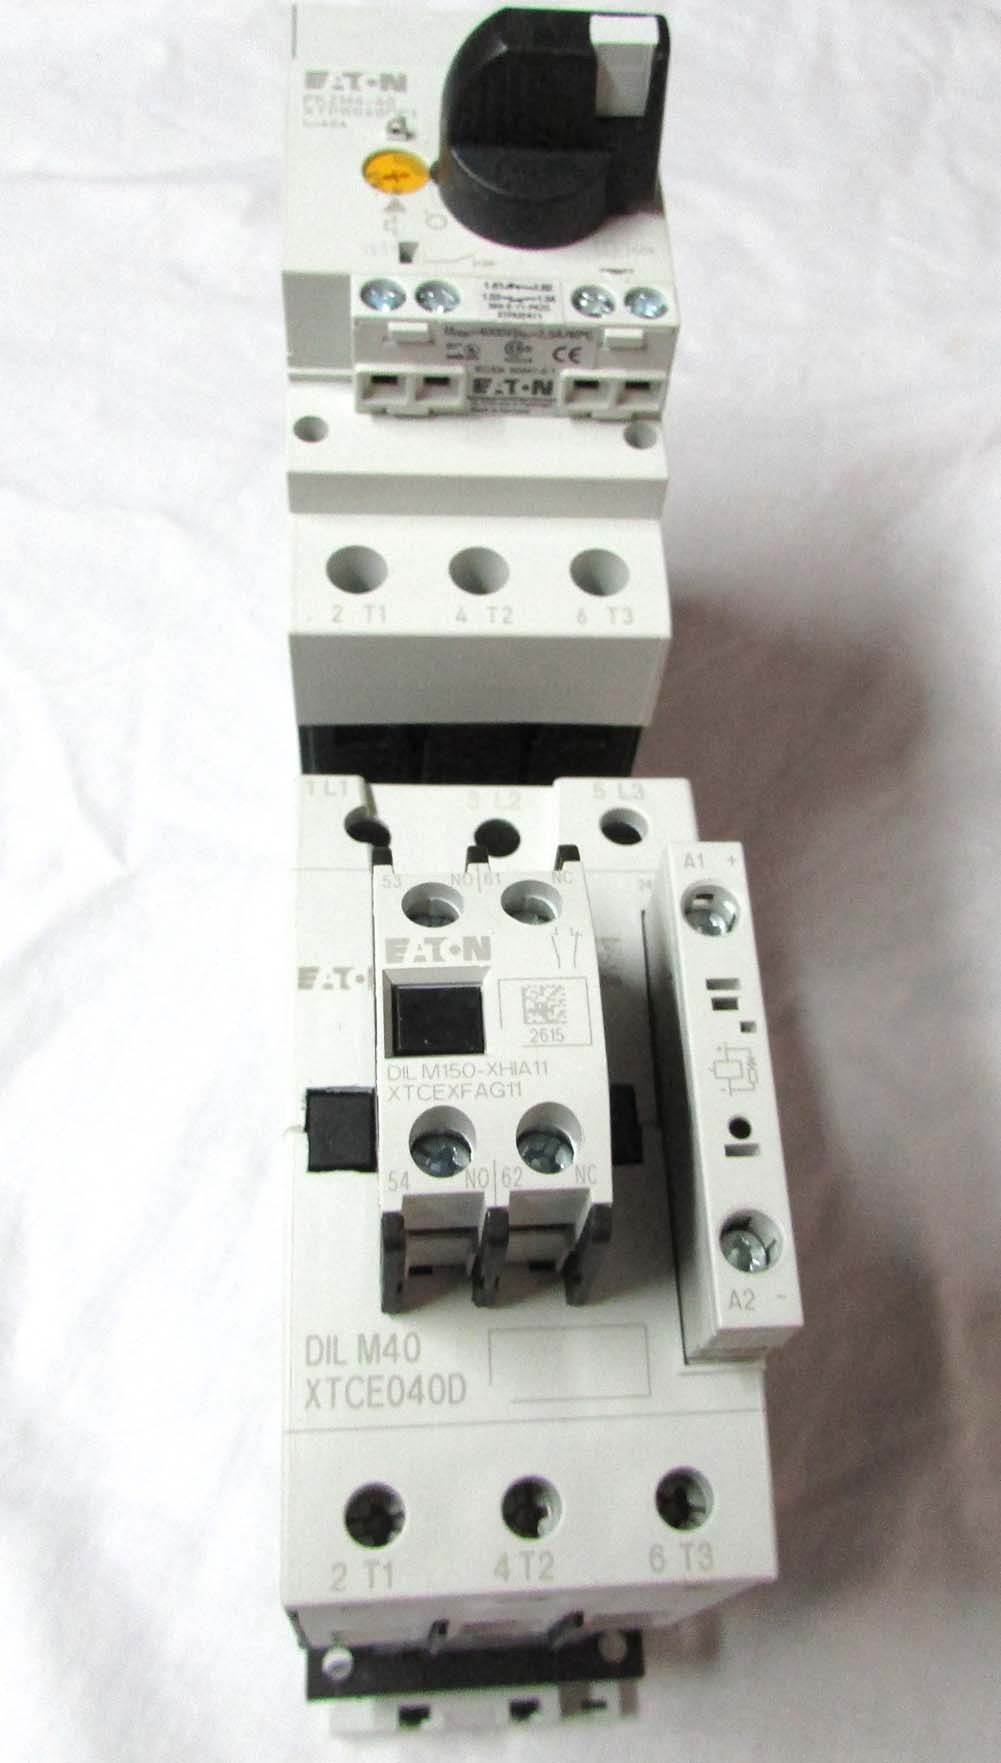 Eaton XTSC040DDTD-JW1 Manual Motor Controller/Starter